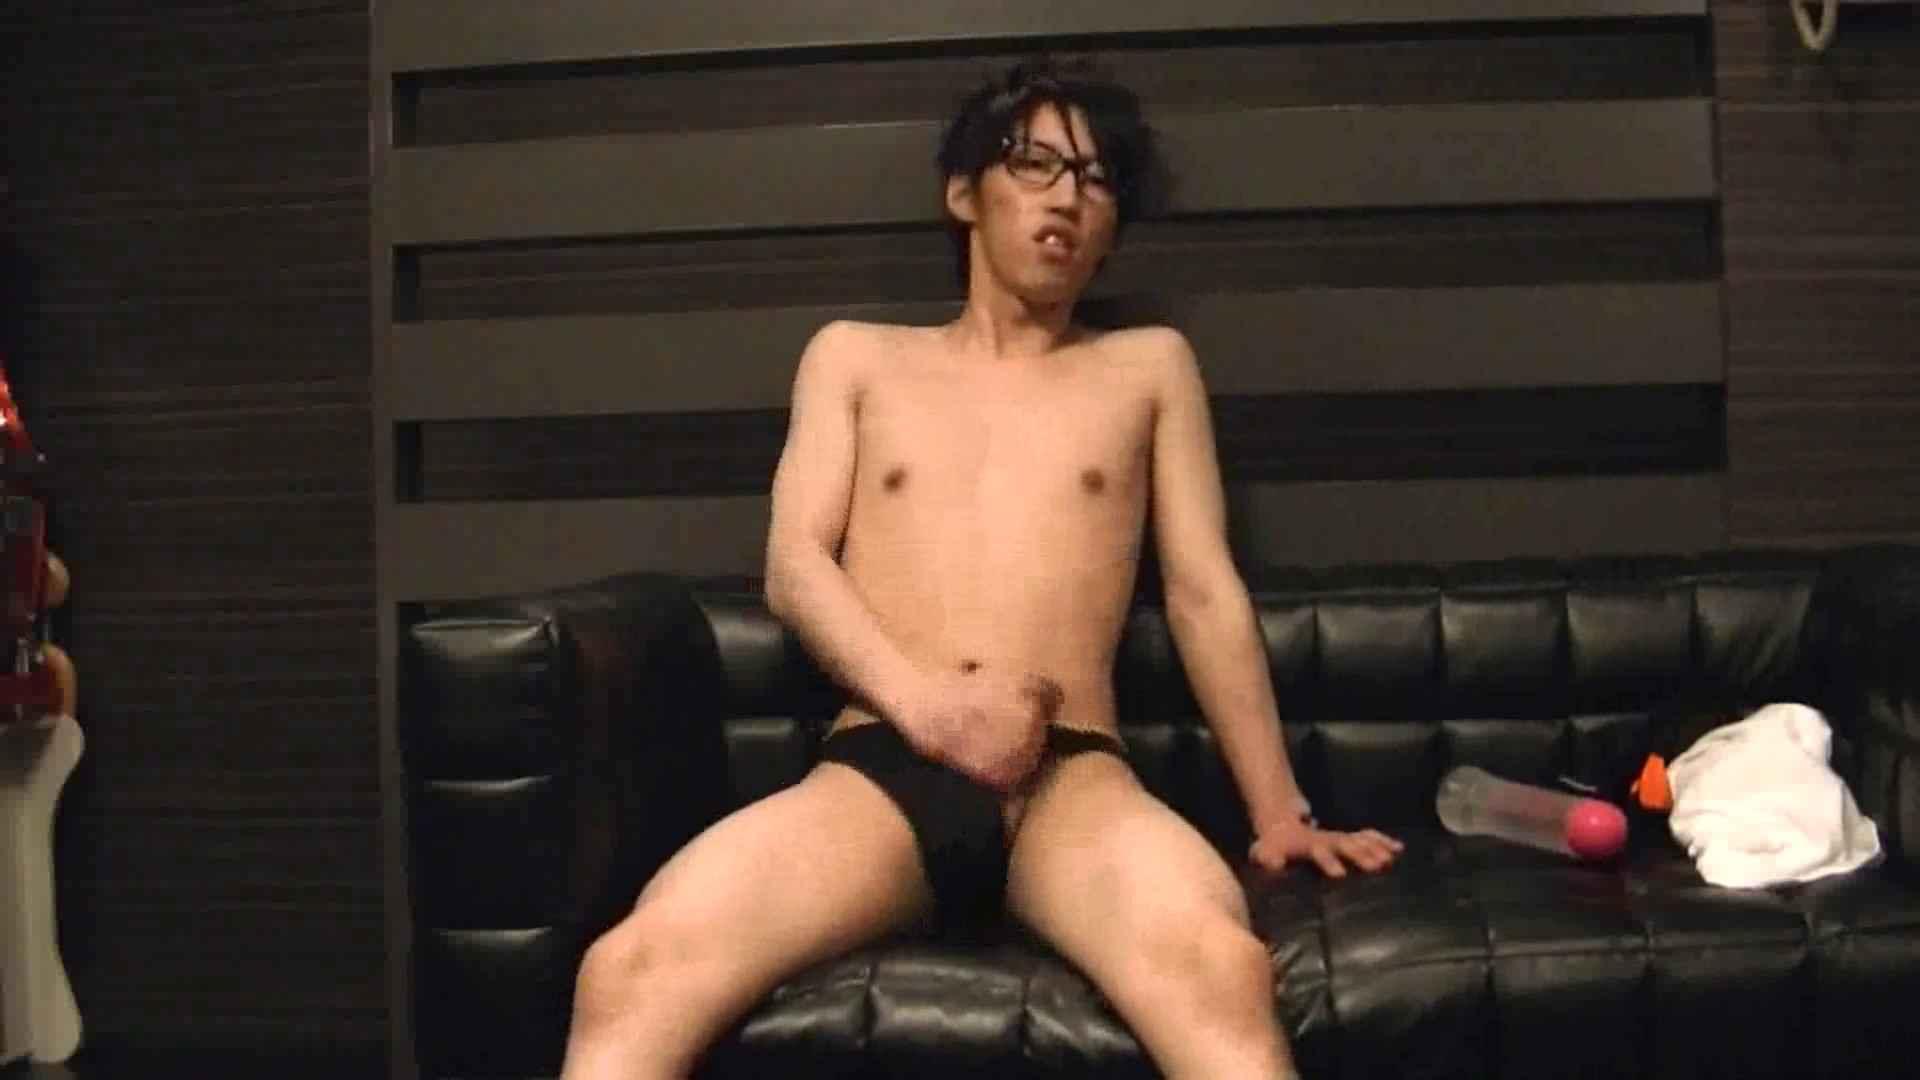 ONA見せカーニバル!! Vol3 男のゲイ天国  6枚 4